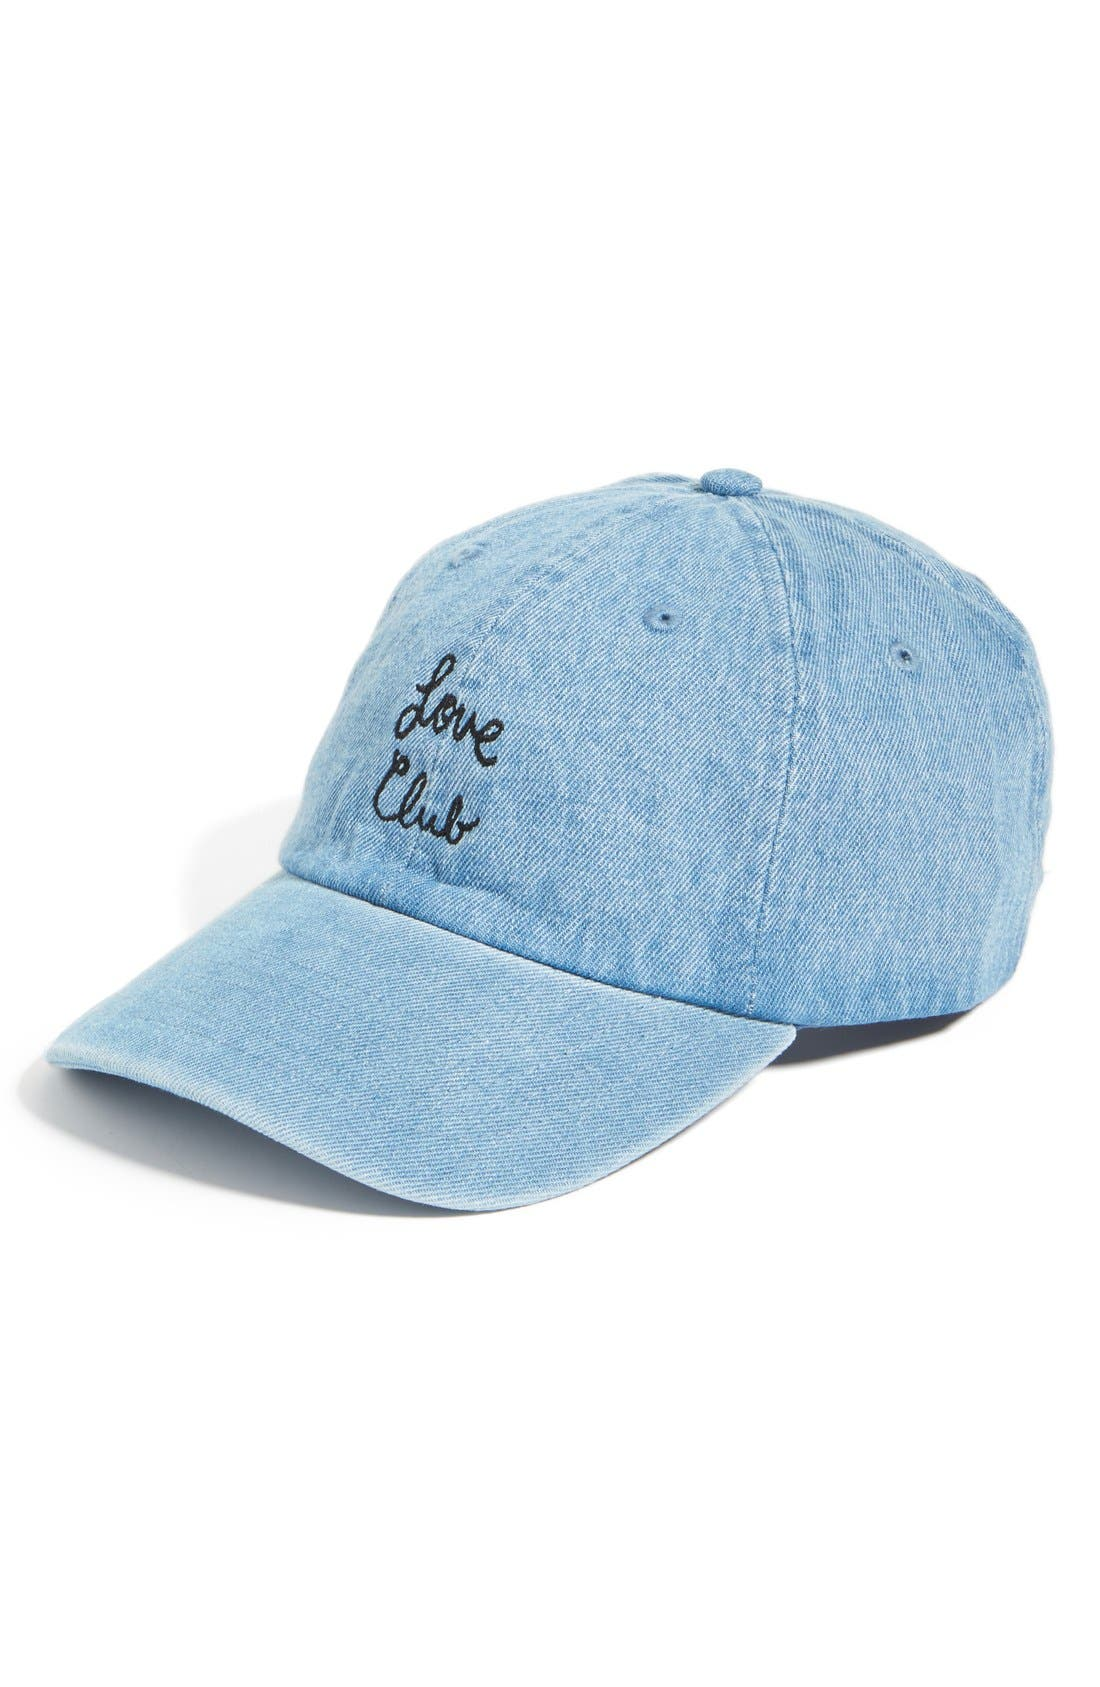 Alternate Image 1 Selected - The Style Club Love Club Baseball Cap